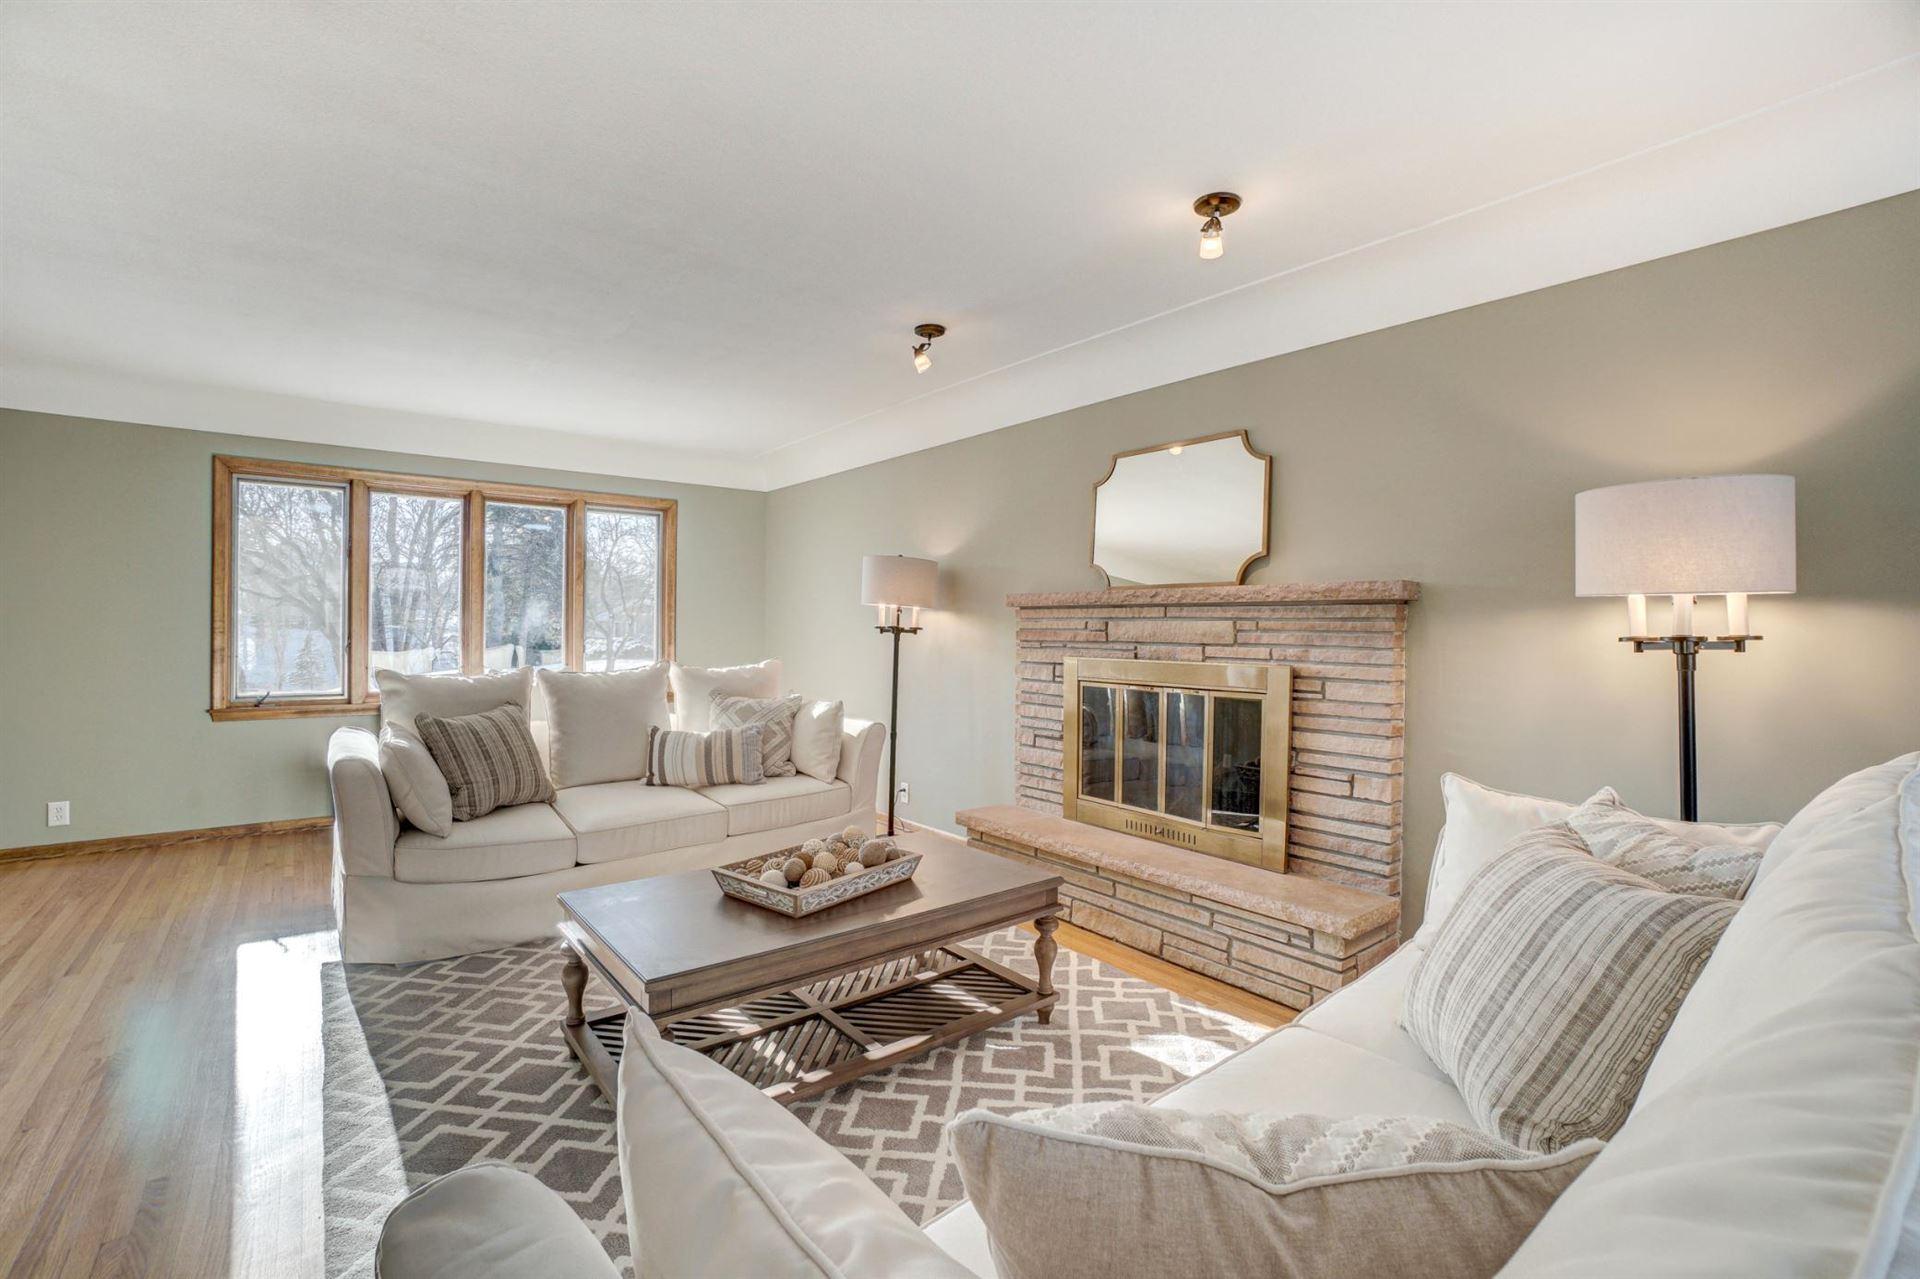 Photo of 4940 Lowry Terrace, Golden Valley, MN 55422 (MLS # 5684780)